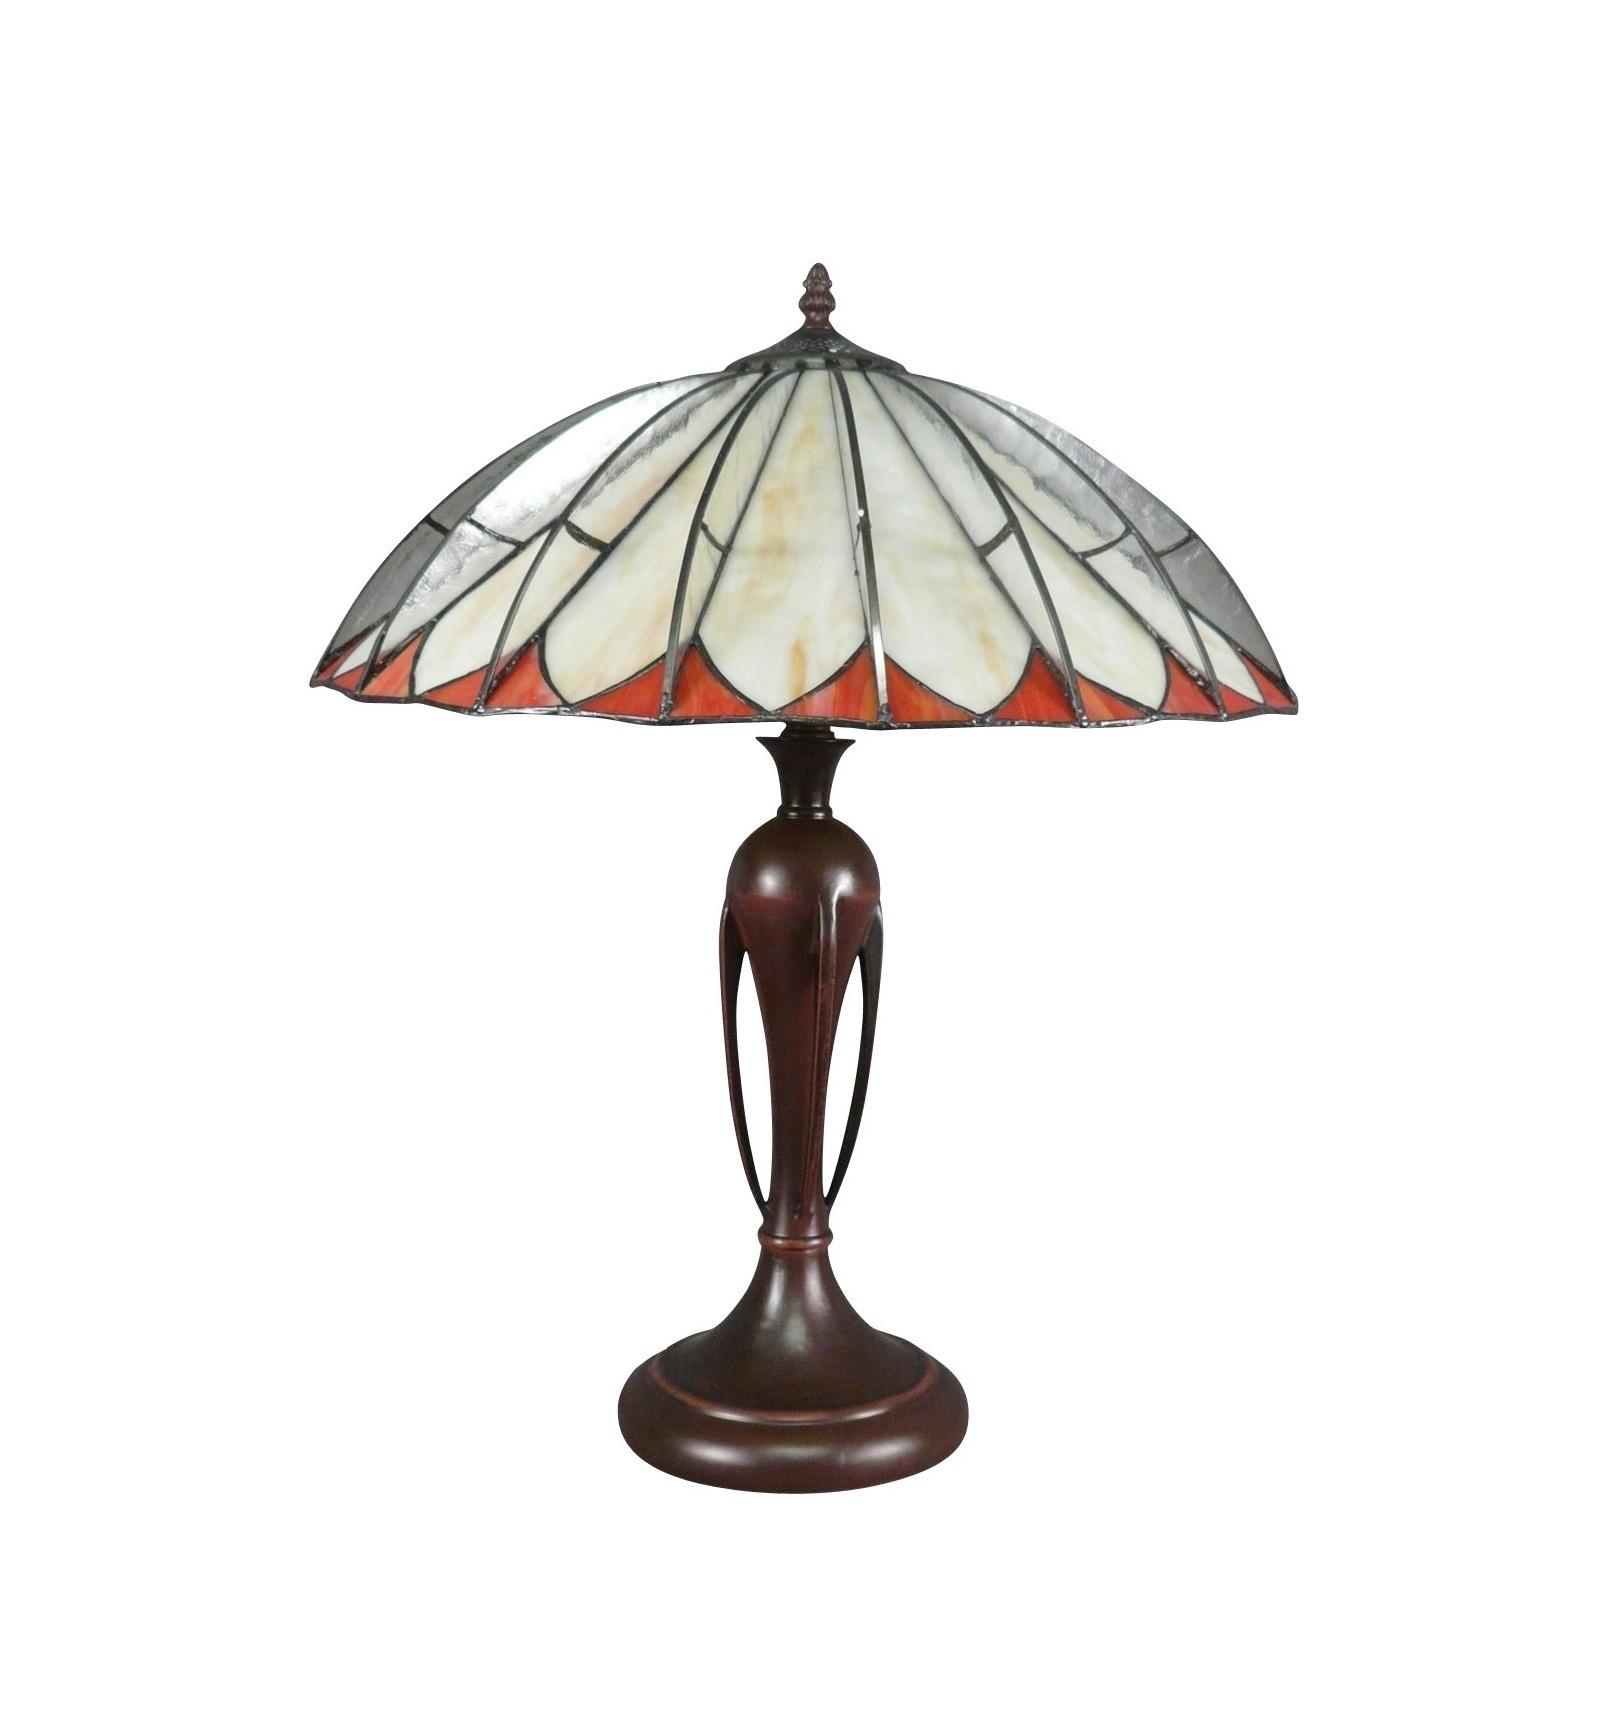 tiffany lamp art deco. Black Bedroom Furniture Sets. Home Design Ideas